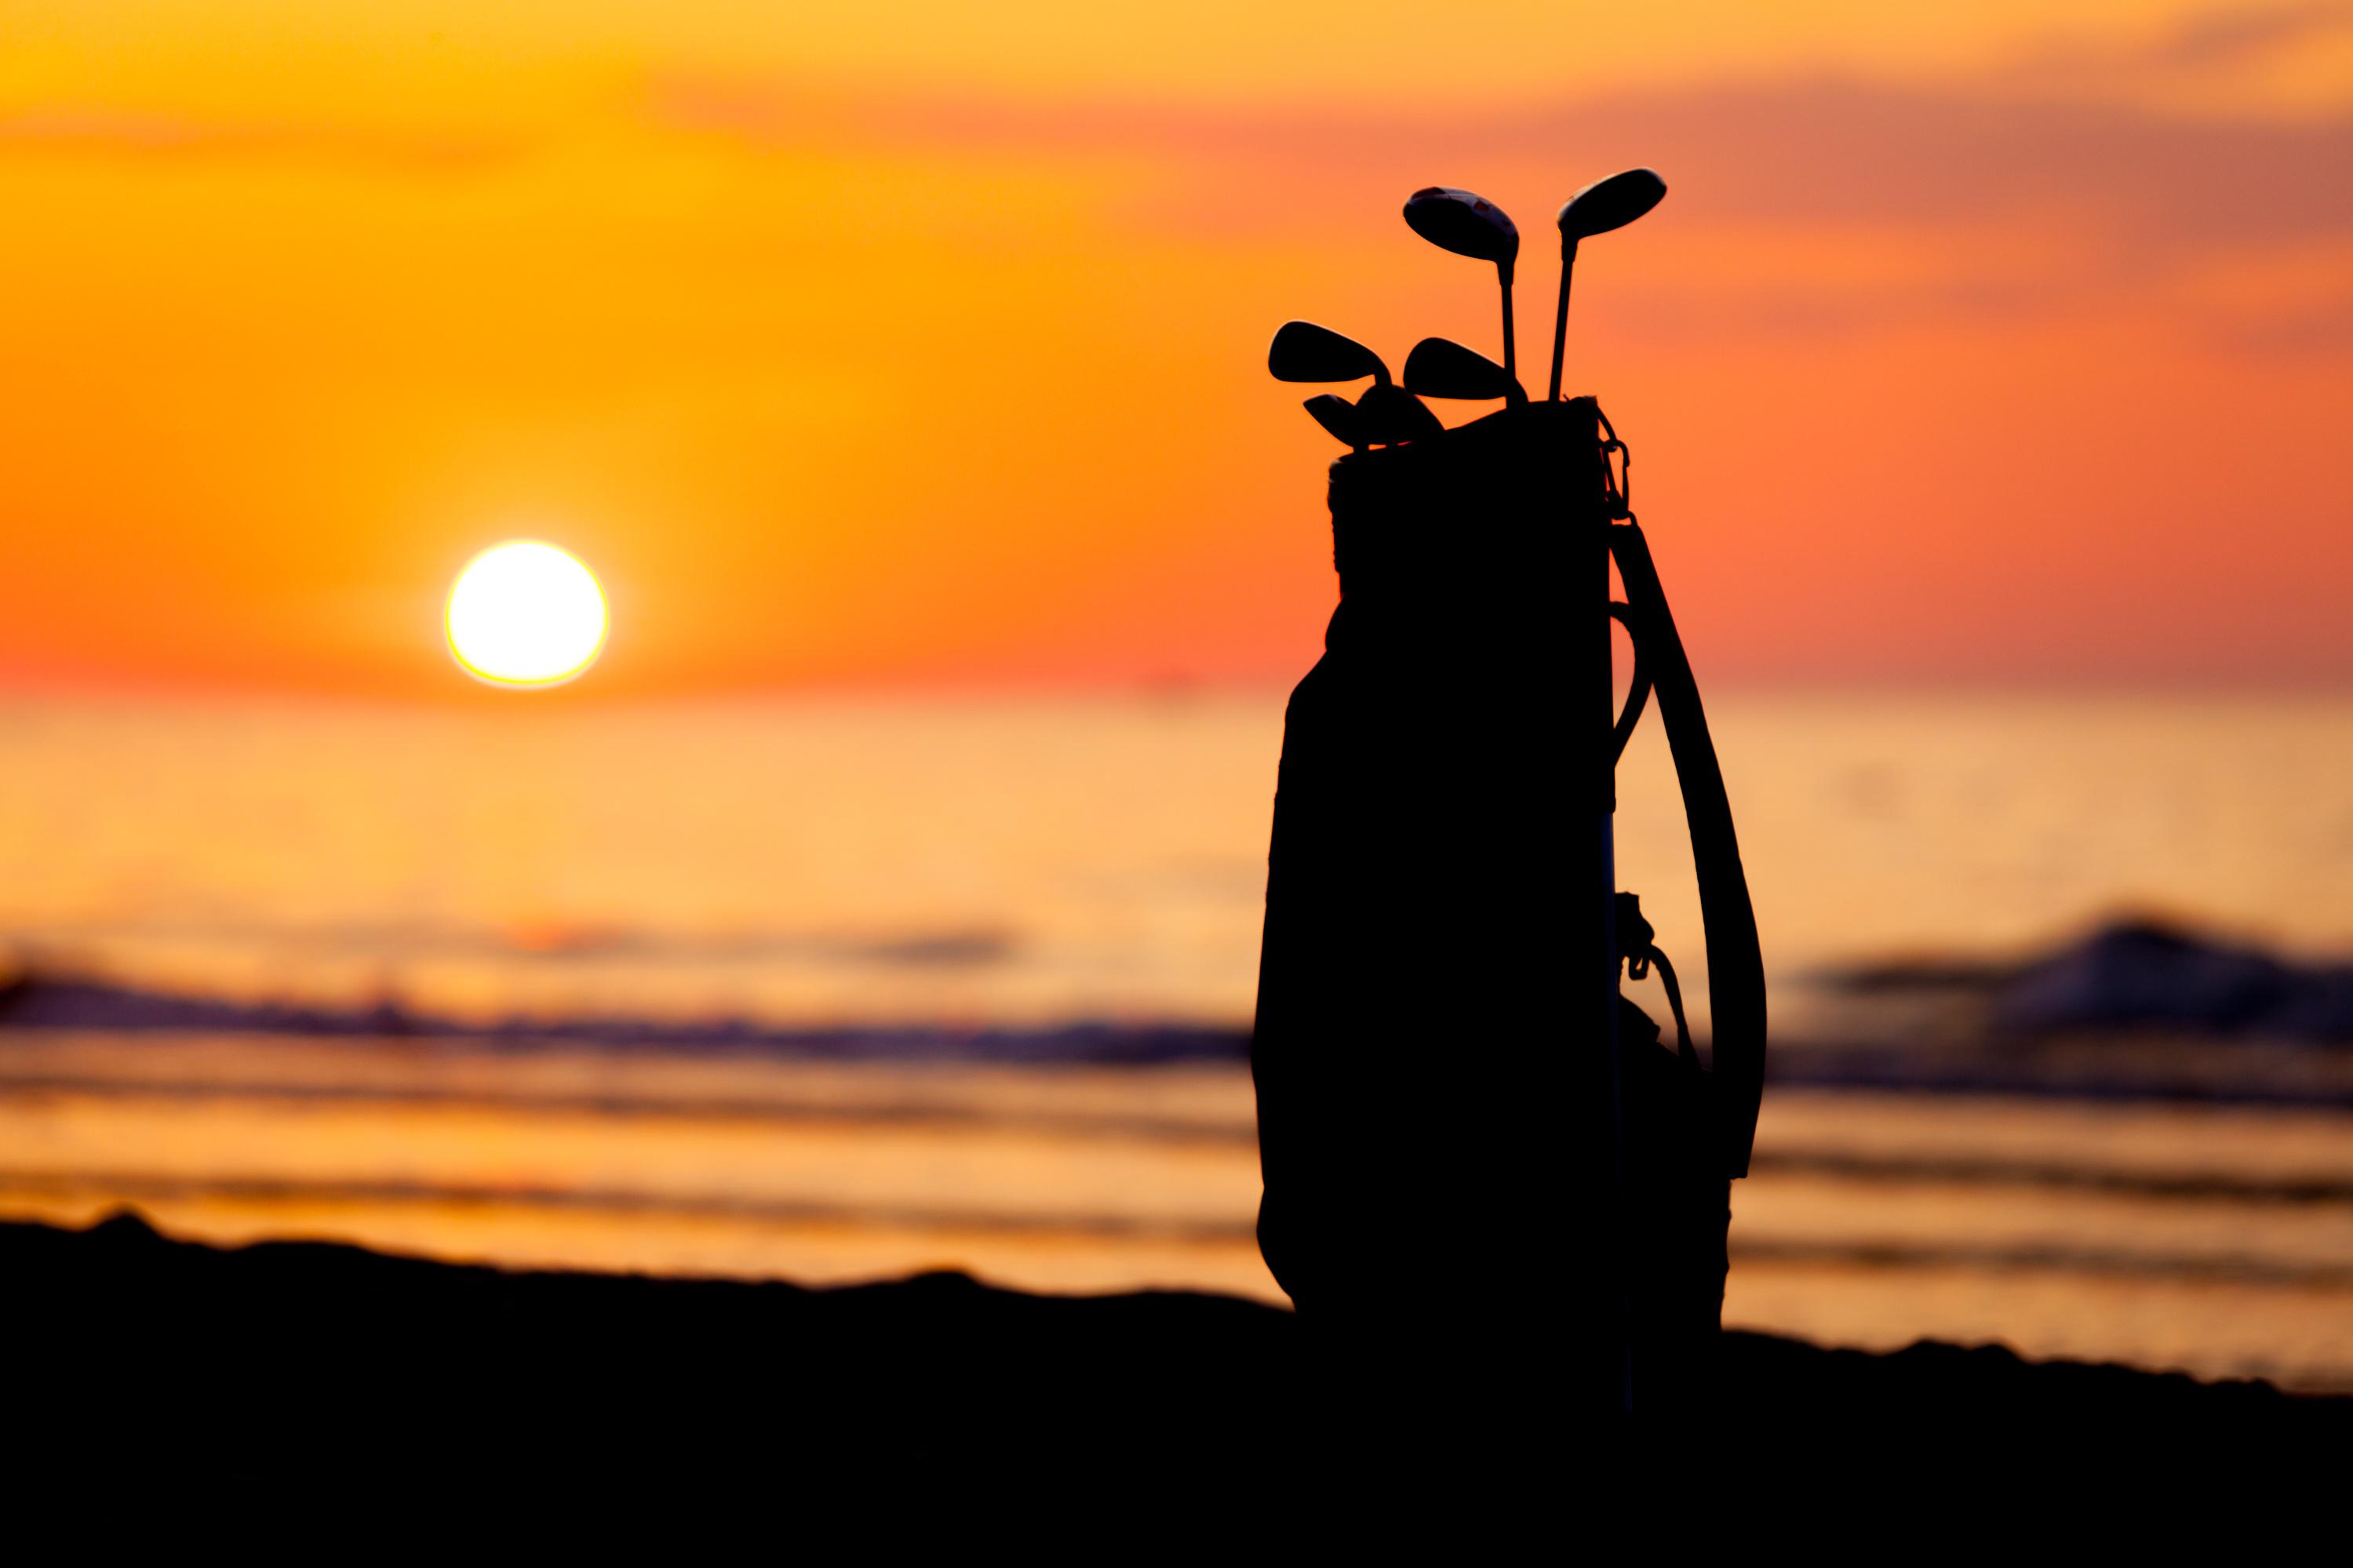 Idyllic shot of sunset and golf clubs